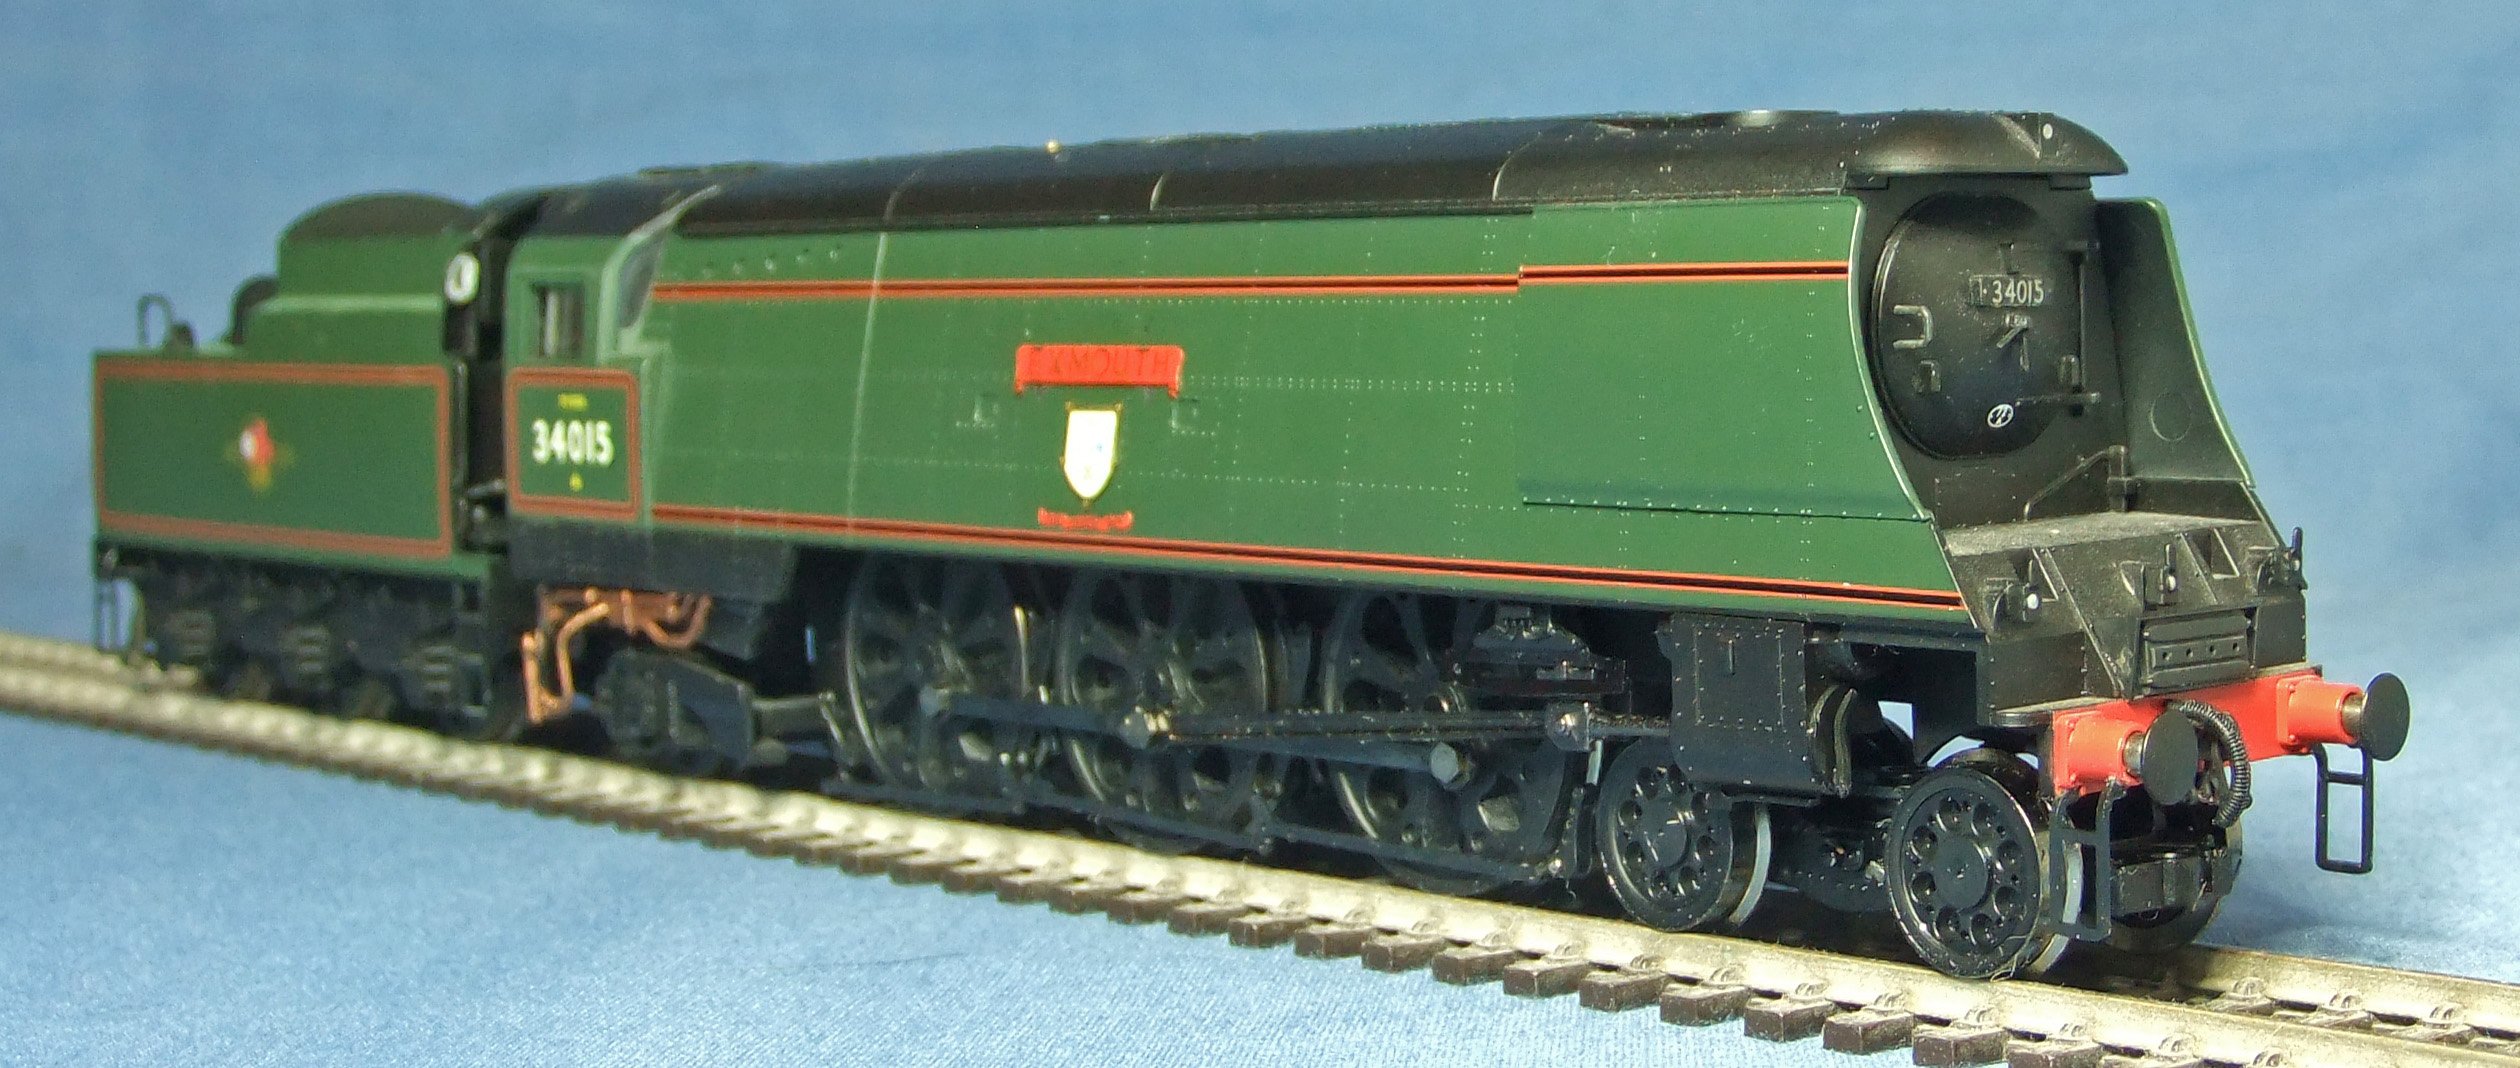 34015-FR-s40